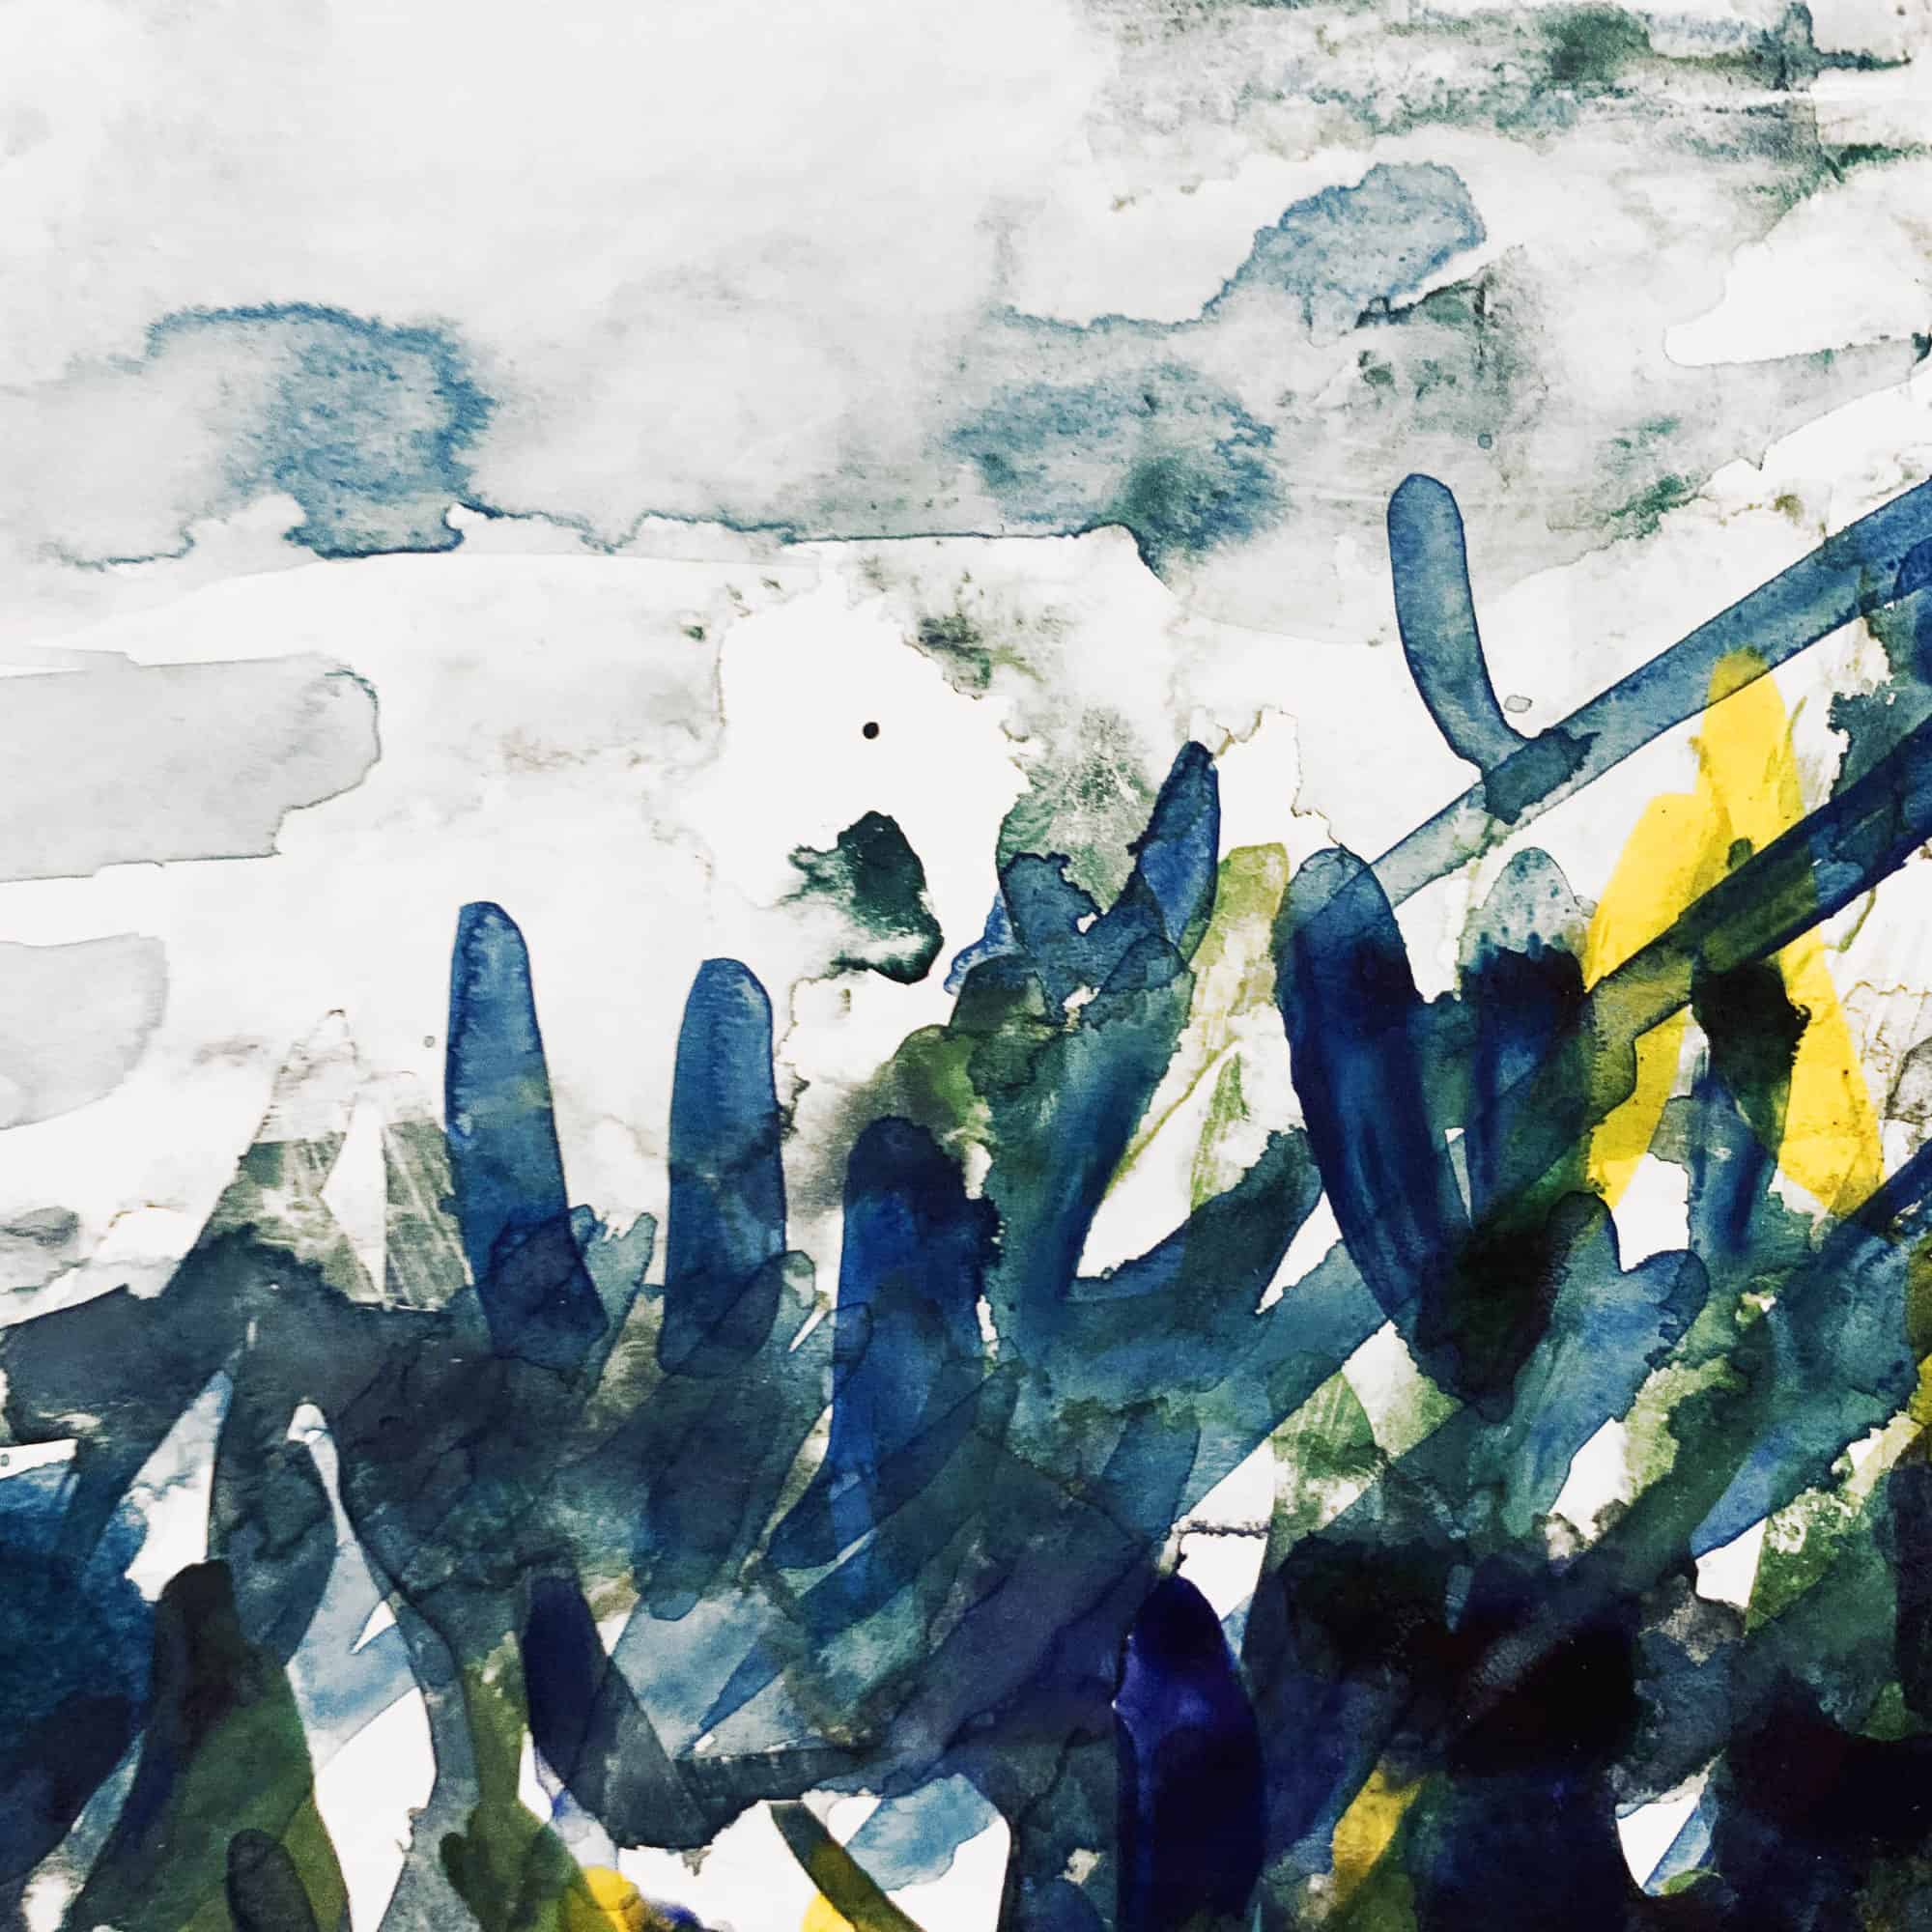 Abstraktes Acrylbild expressive blau grüne Blätter